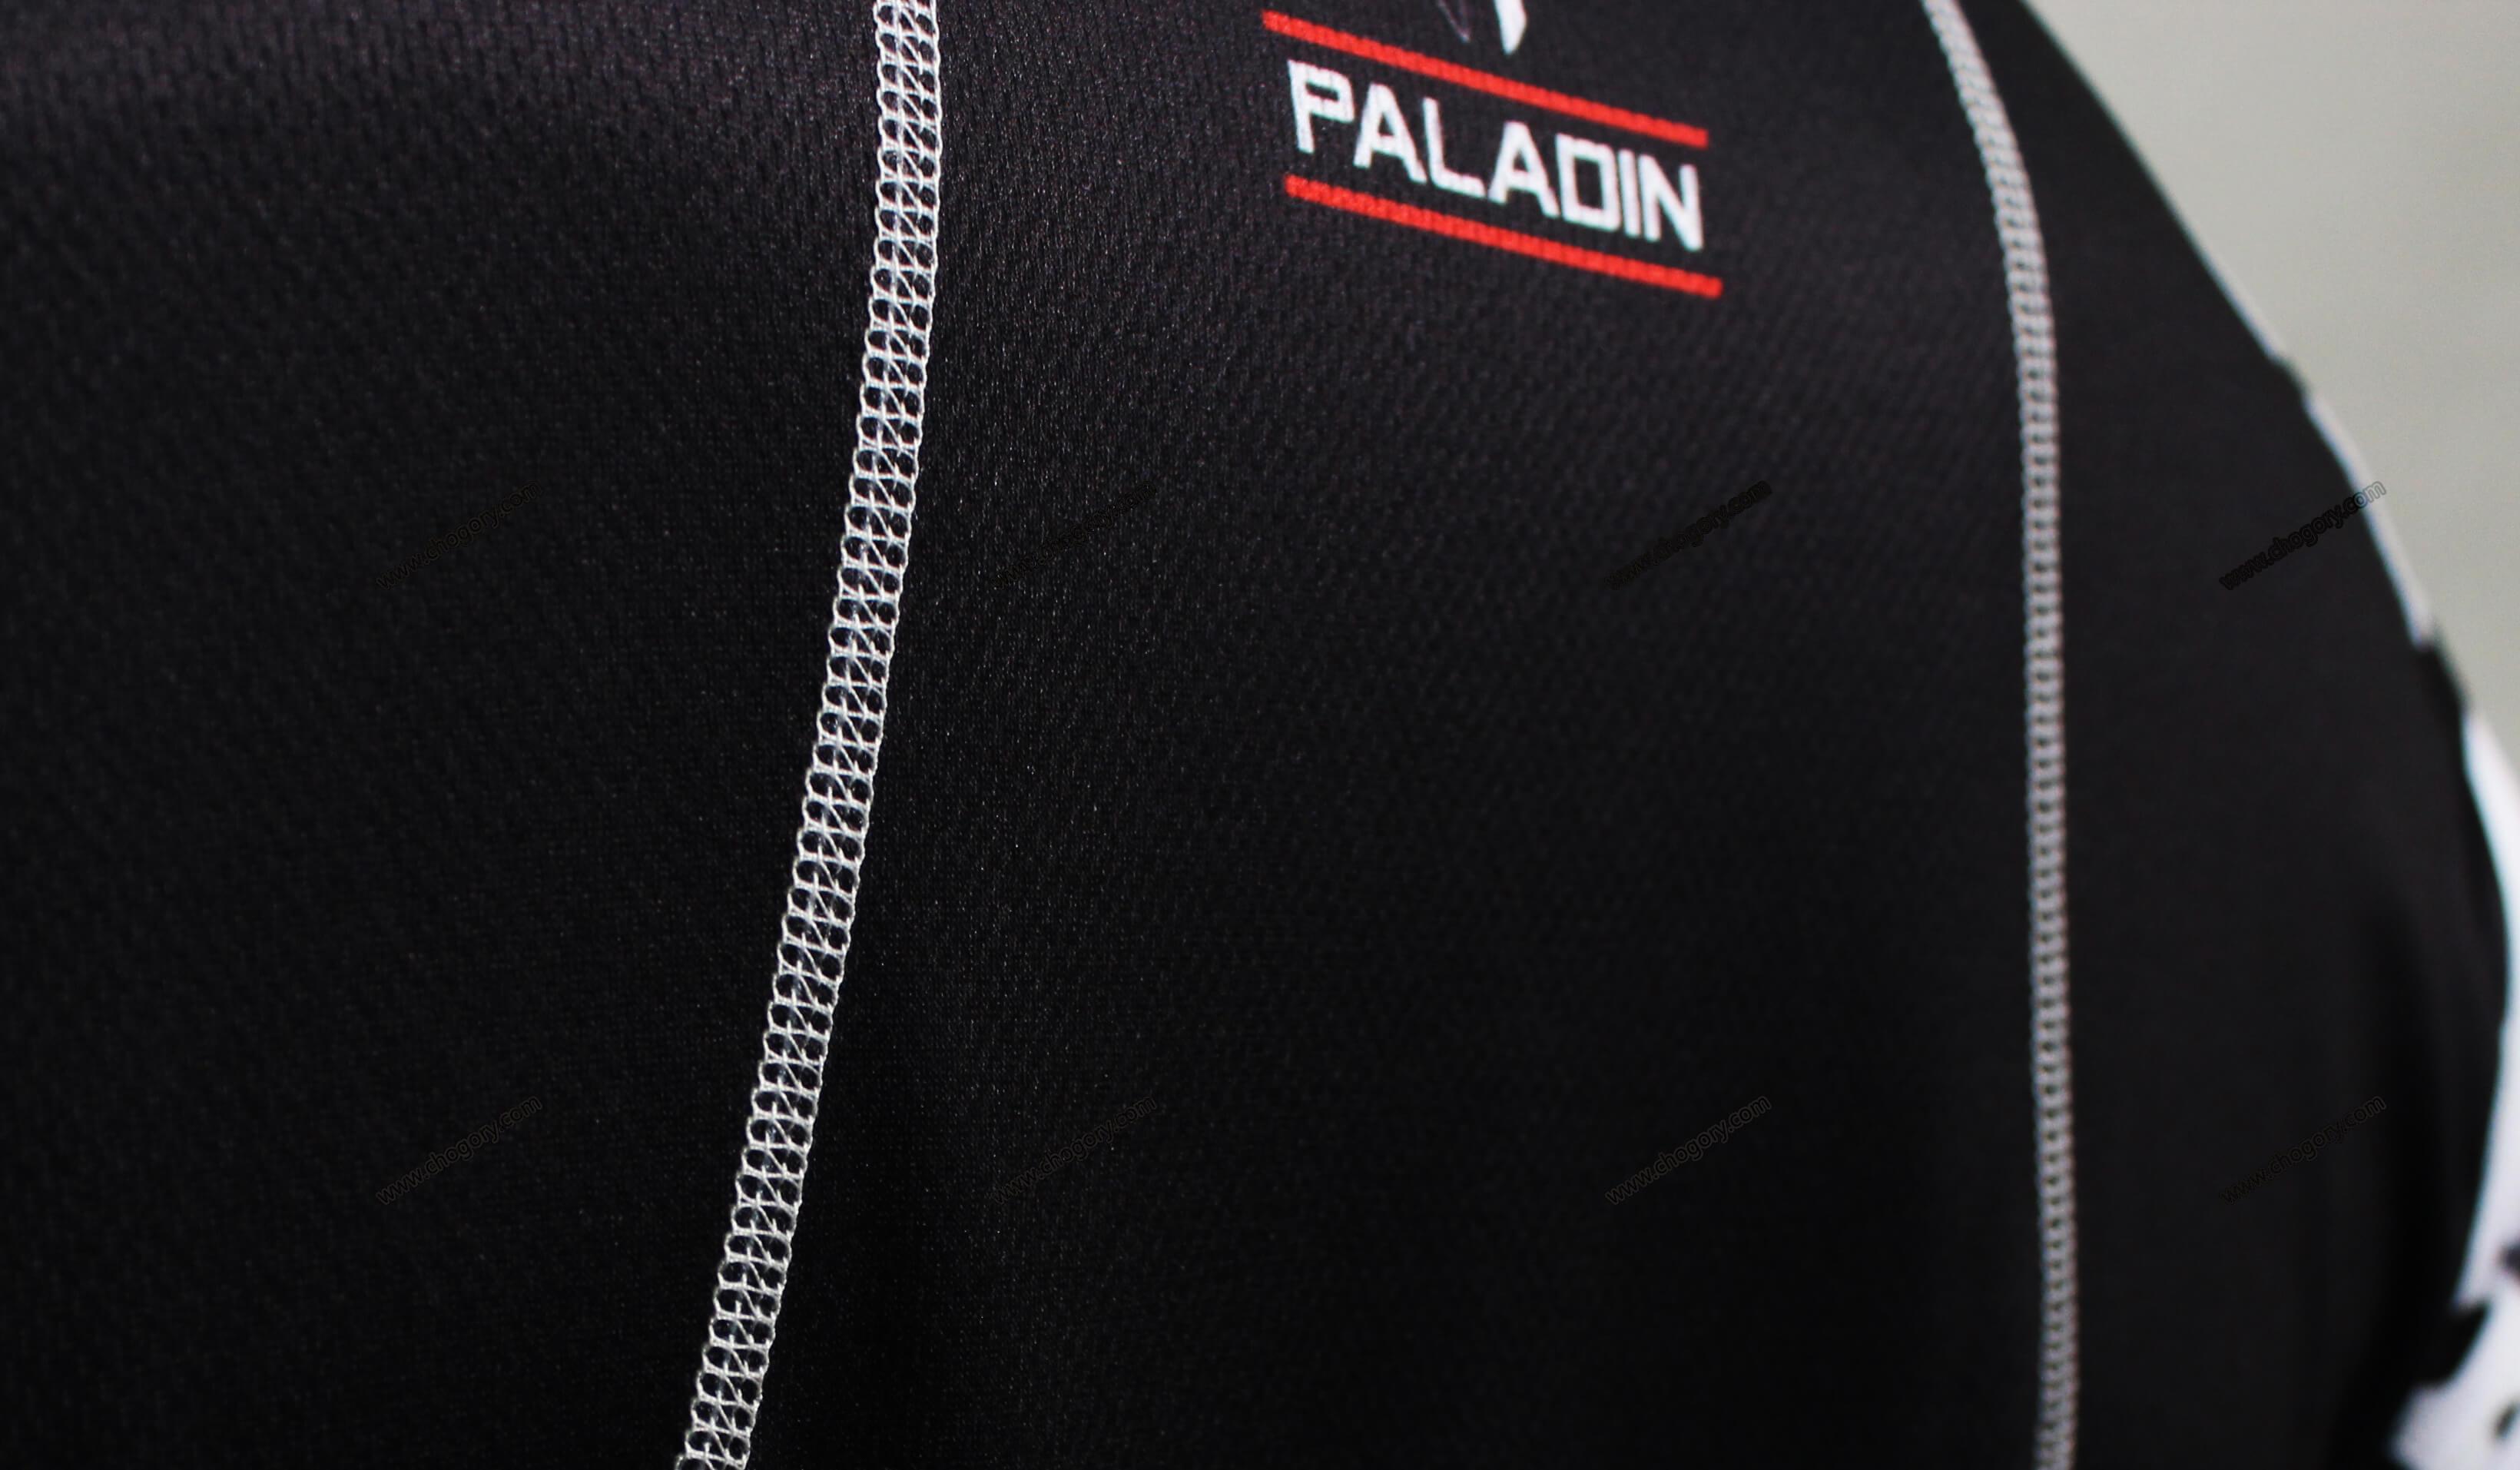 144f783fb ... Wave Patter Sleeves Black Cycling Jerseys Long Sleeve Men s Bike Jersey  ...